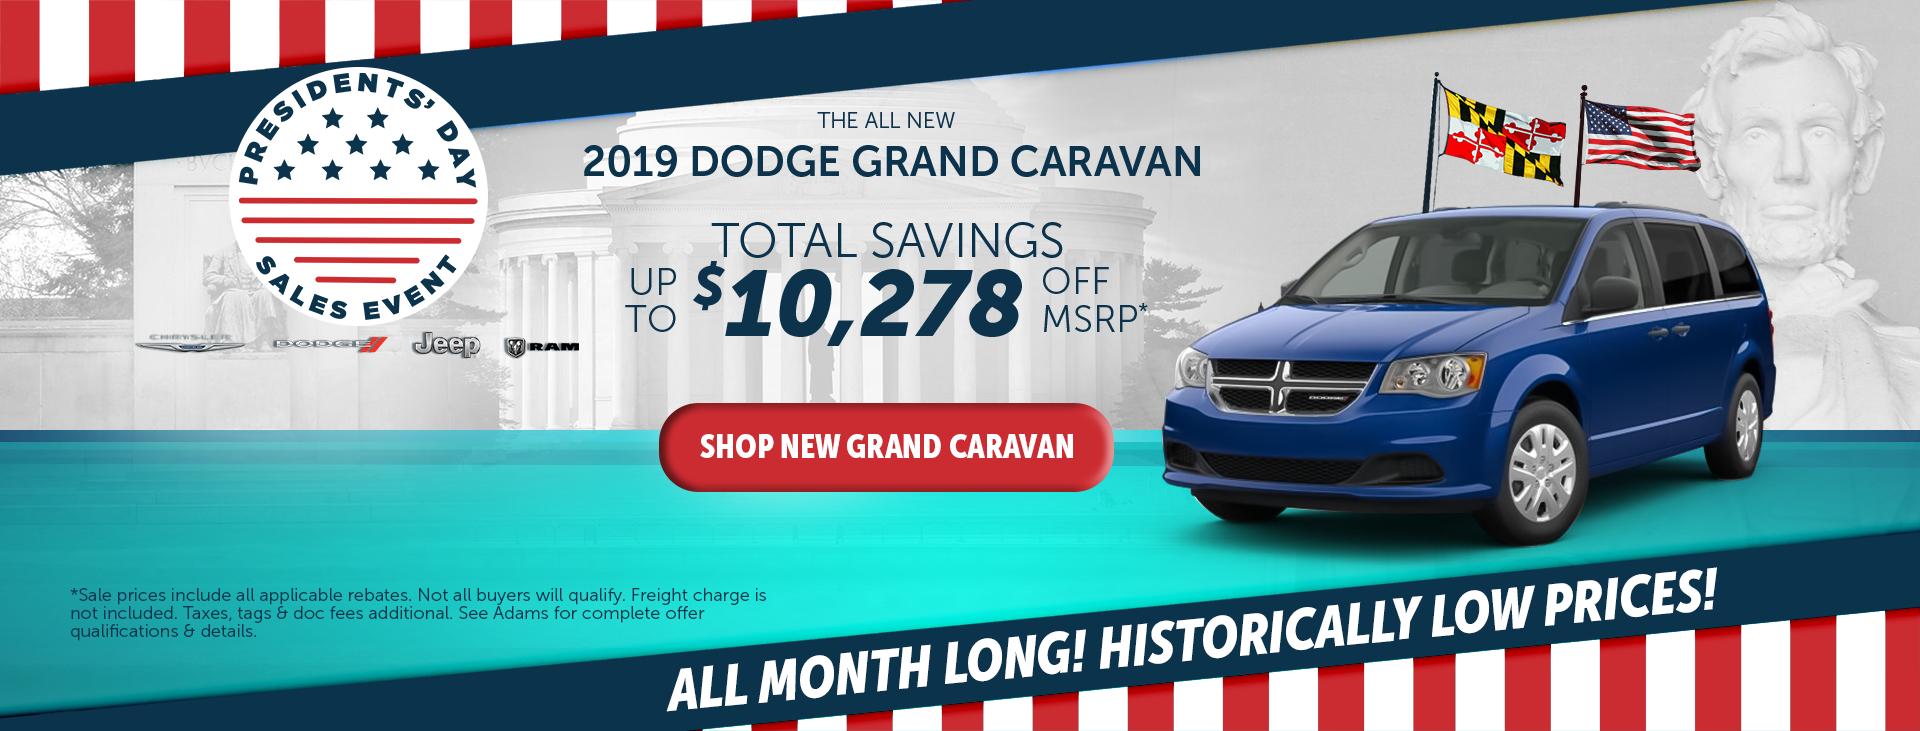 adams chrysler dodge jeep ram 2019 dodge grand caravan